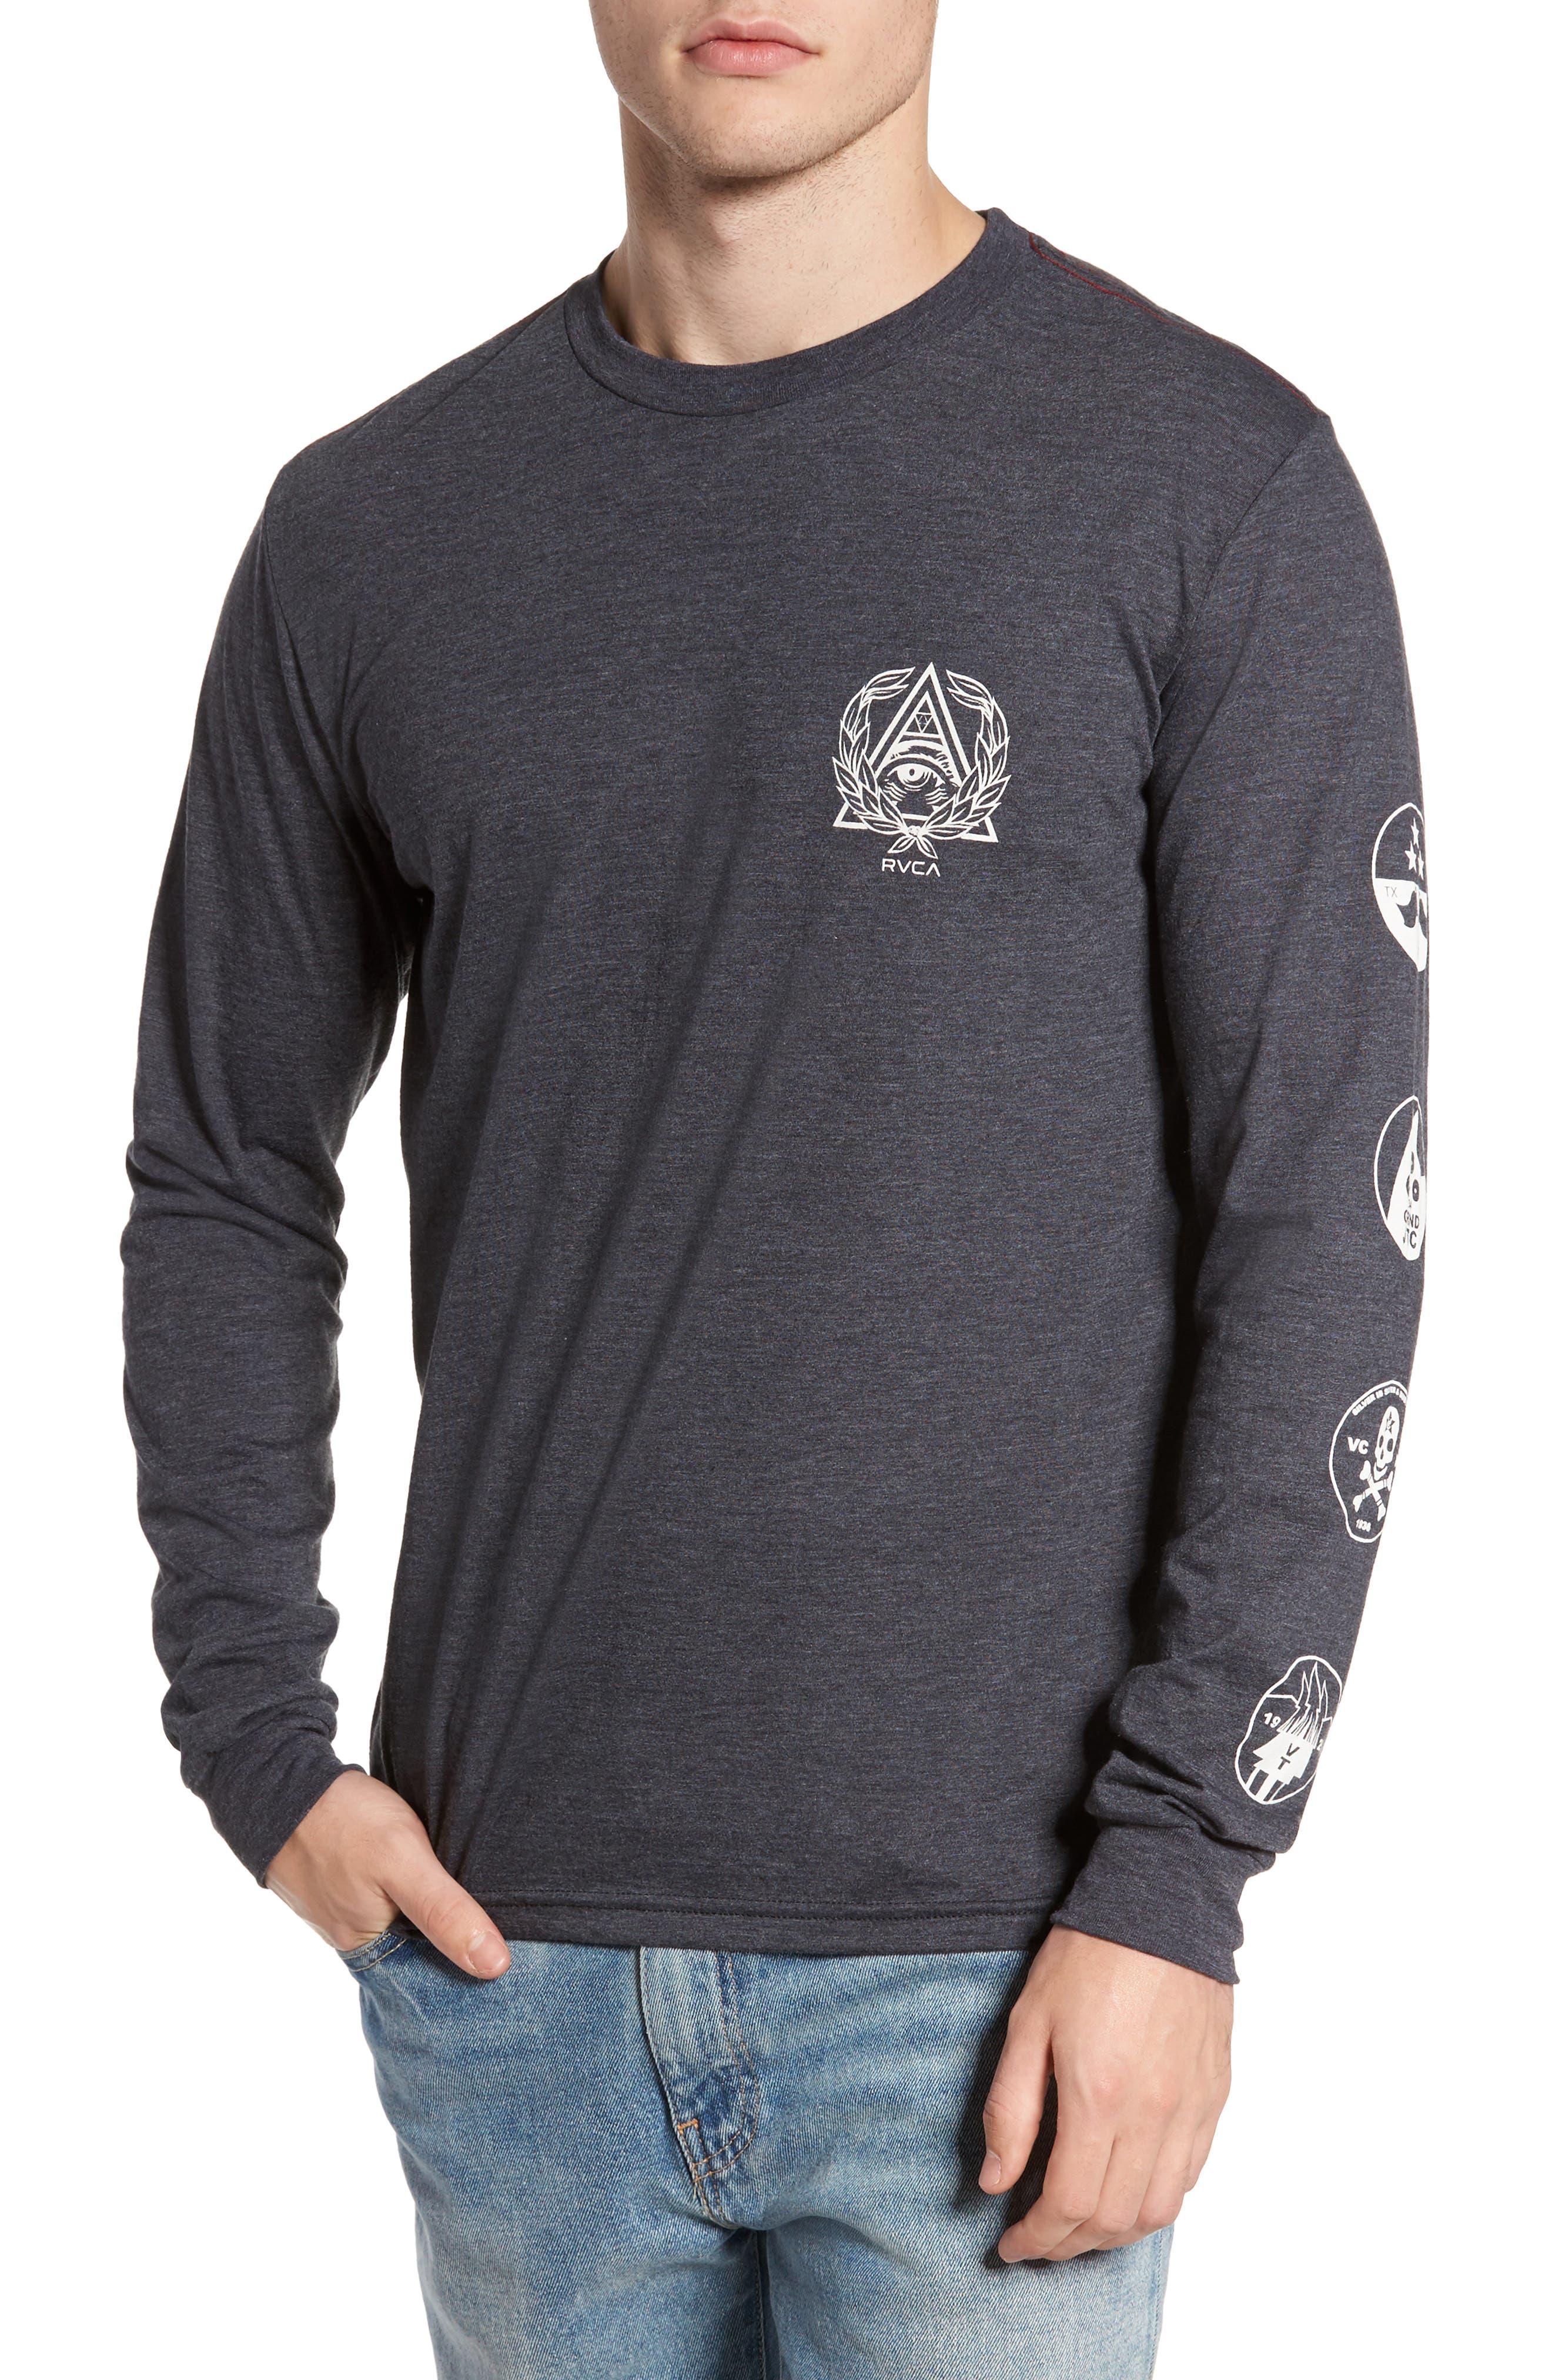 Prigus Sport Team T-Shirt,                             Main thumbnail 1, color,                             001